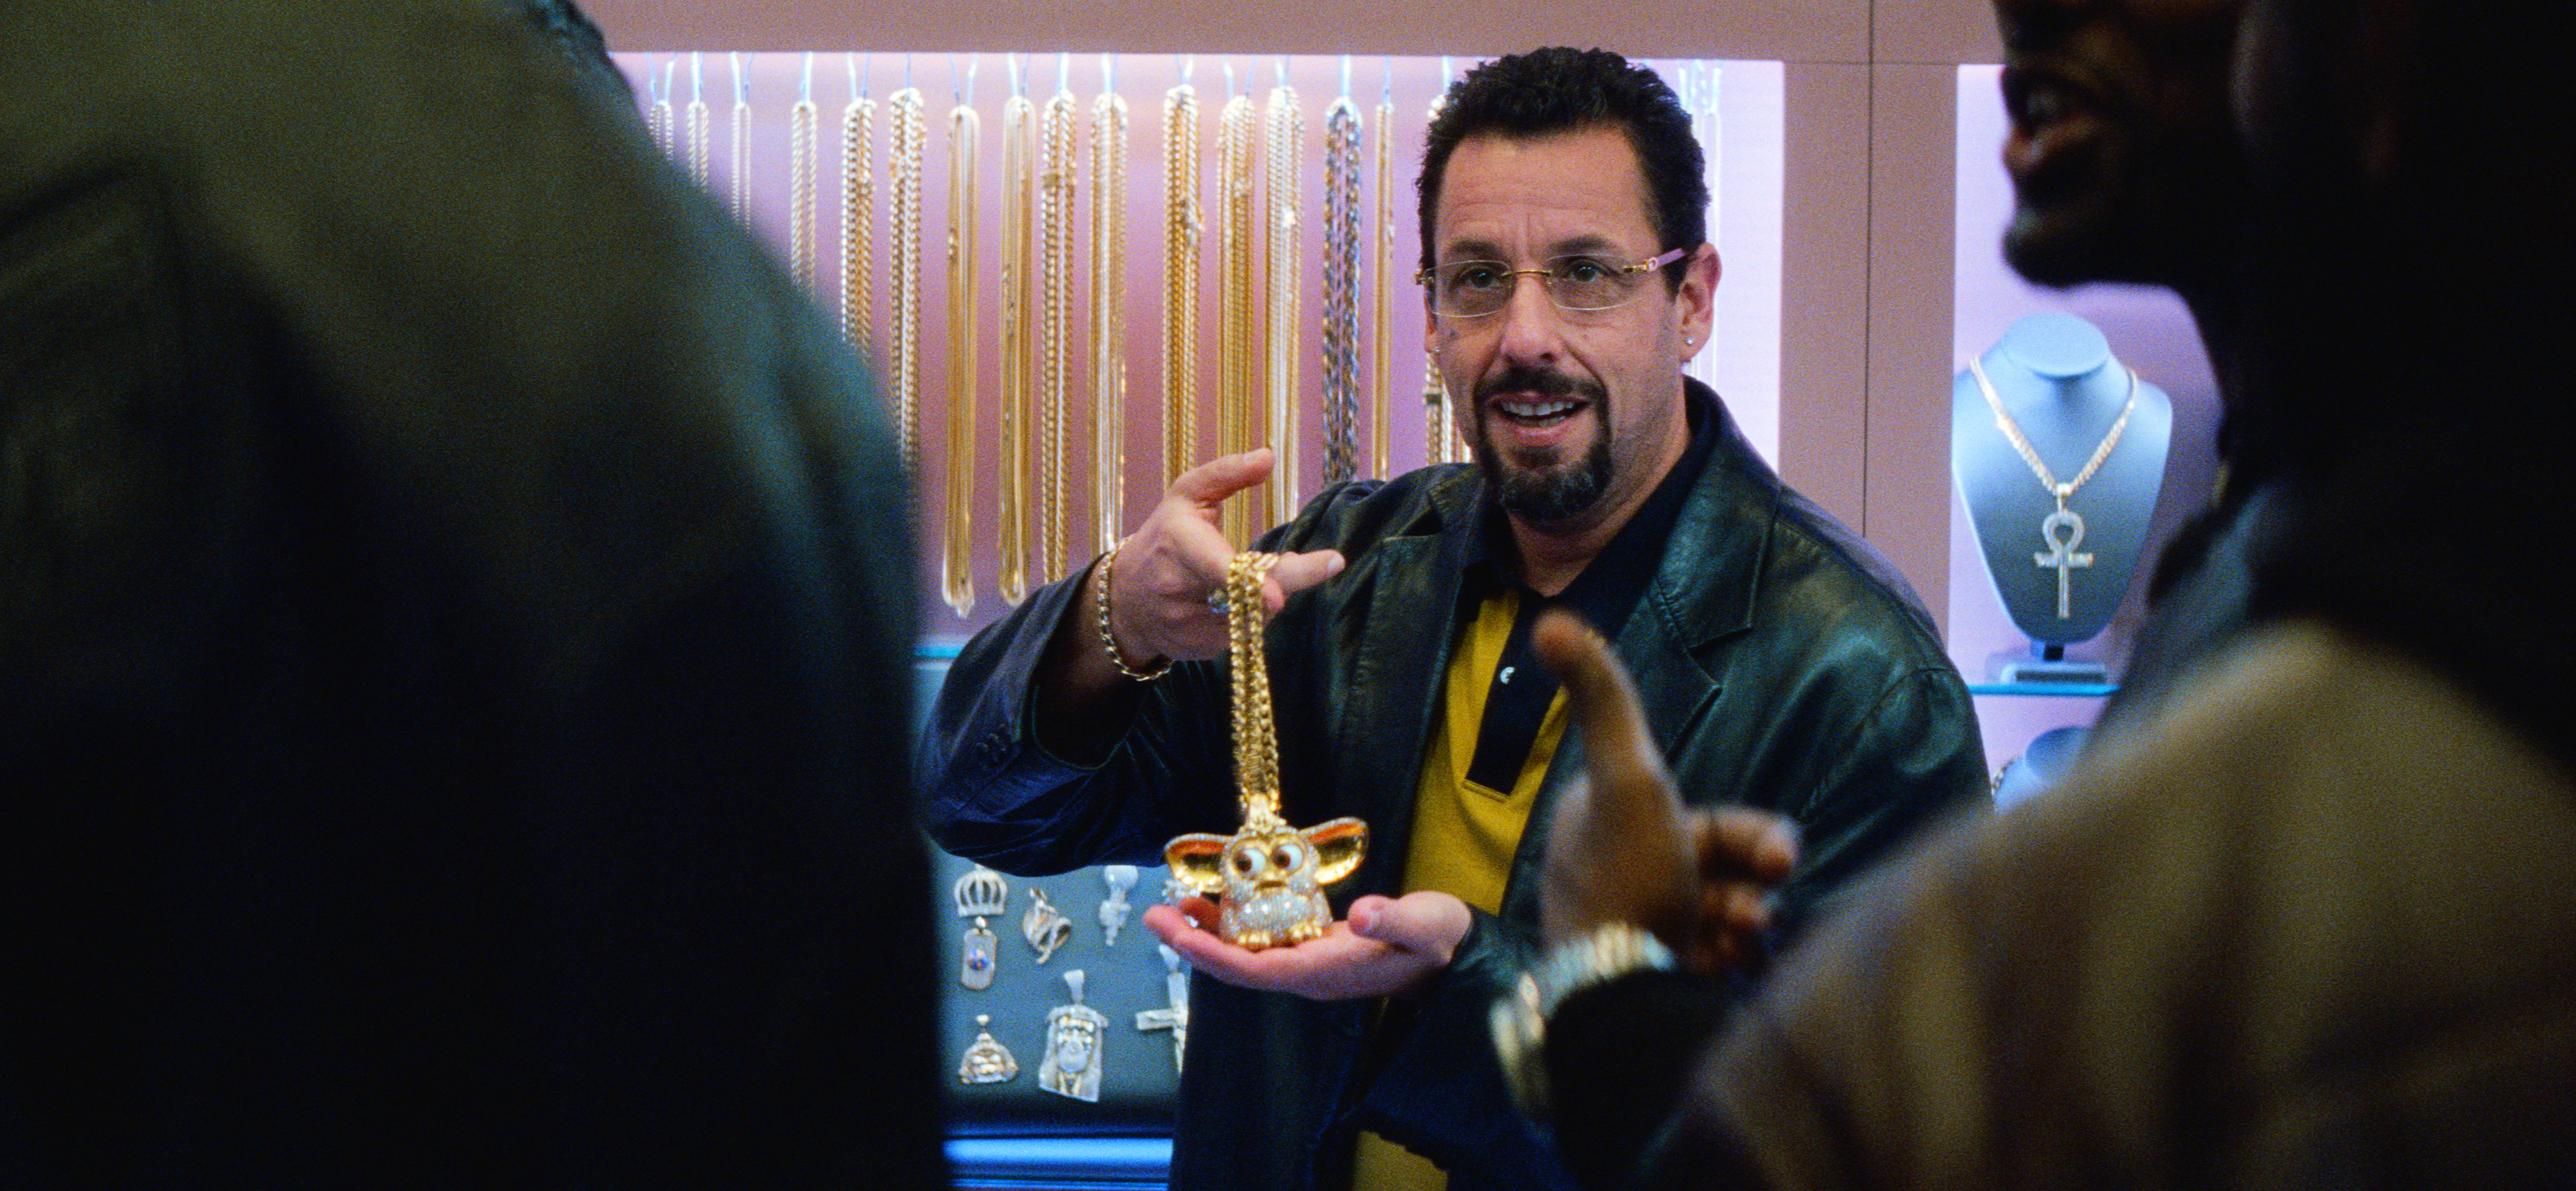 Howard Ratner (Adam Sandler) holds up a diamond-encrusted Furby necklace